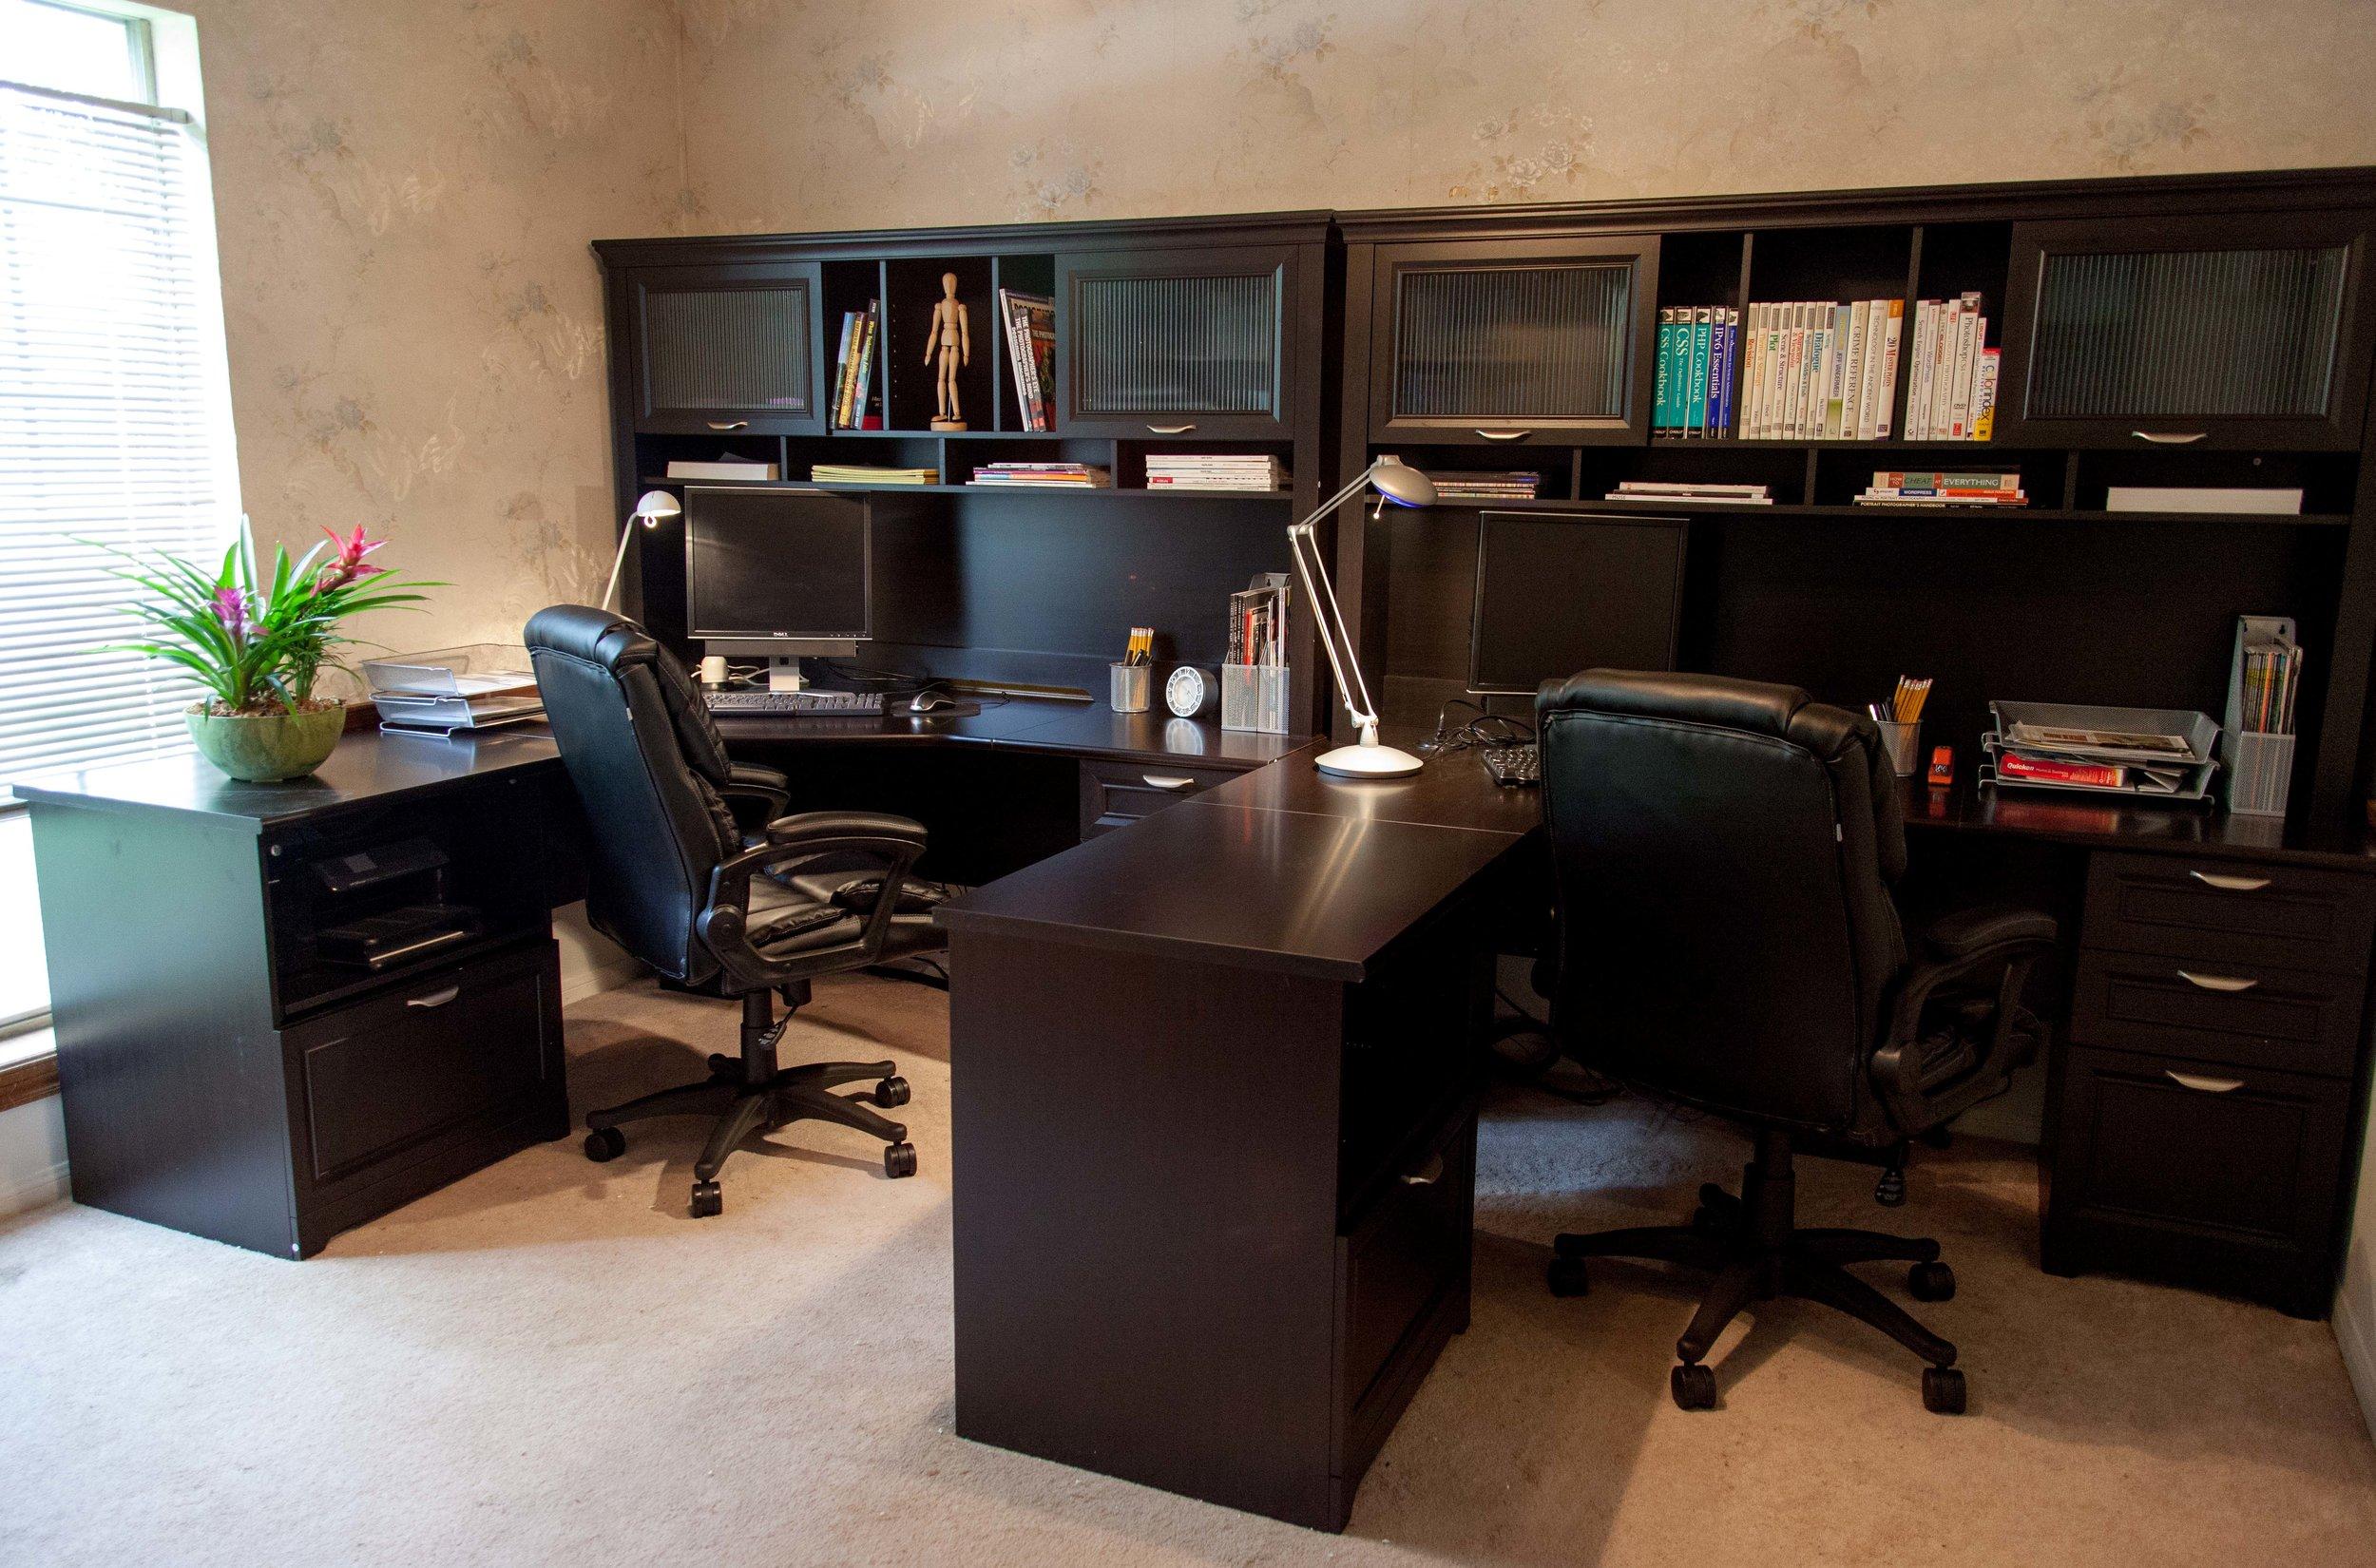 home-organization-interior-decorator-professional-organizer-houston-texas.jpg